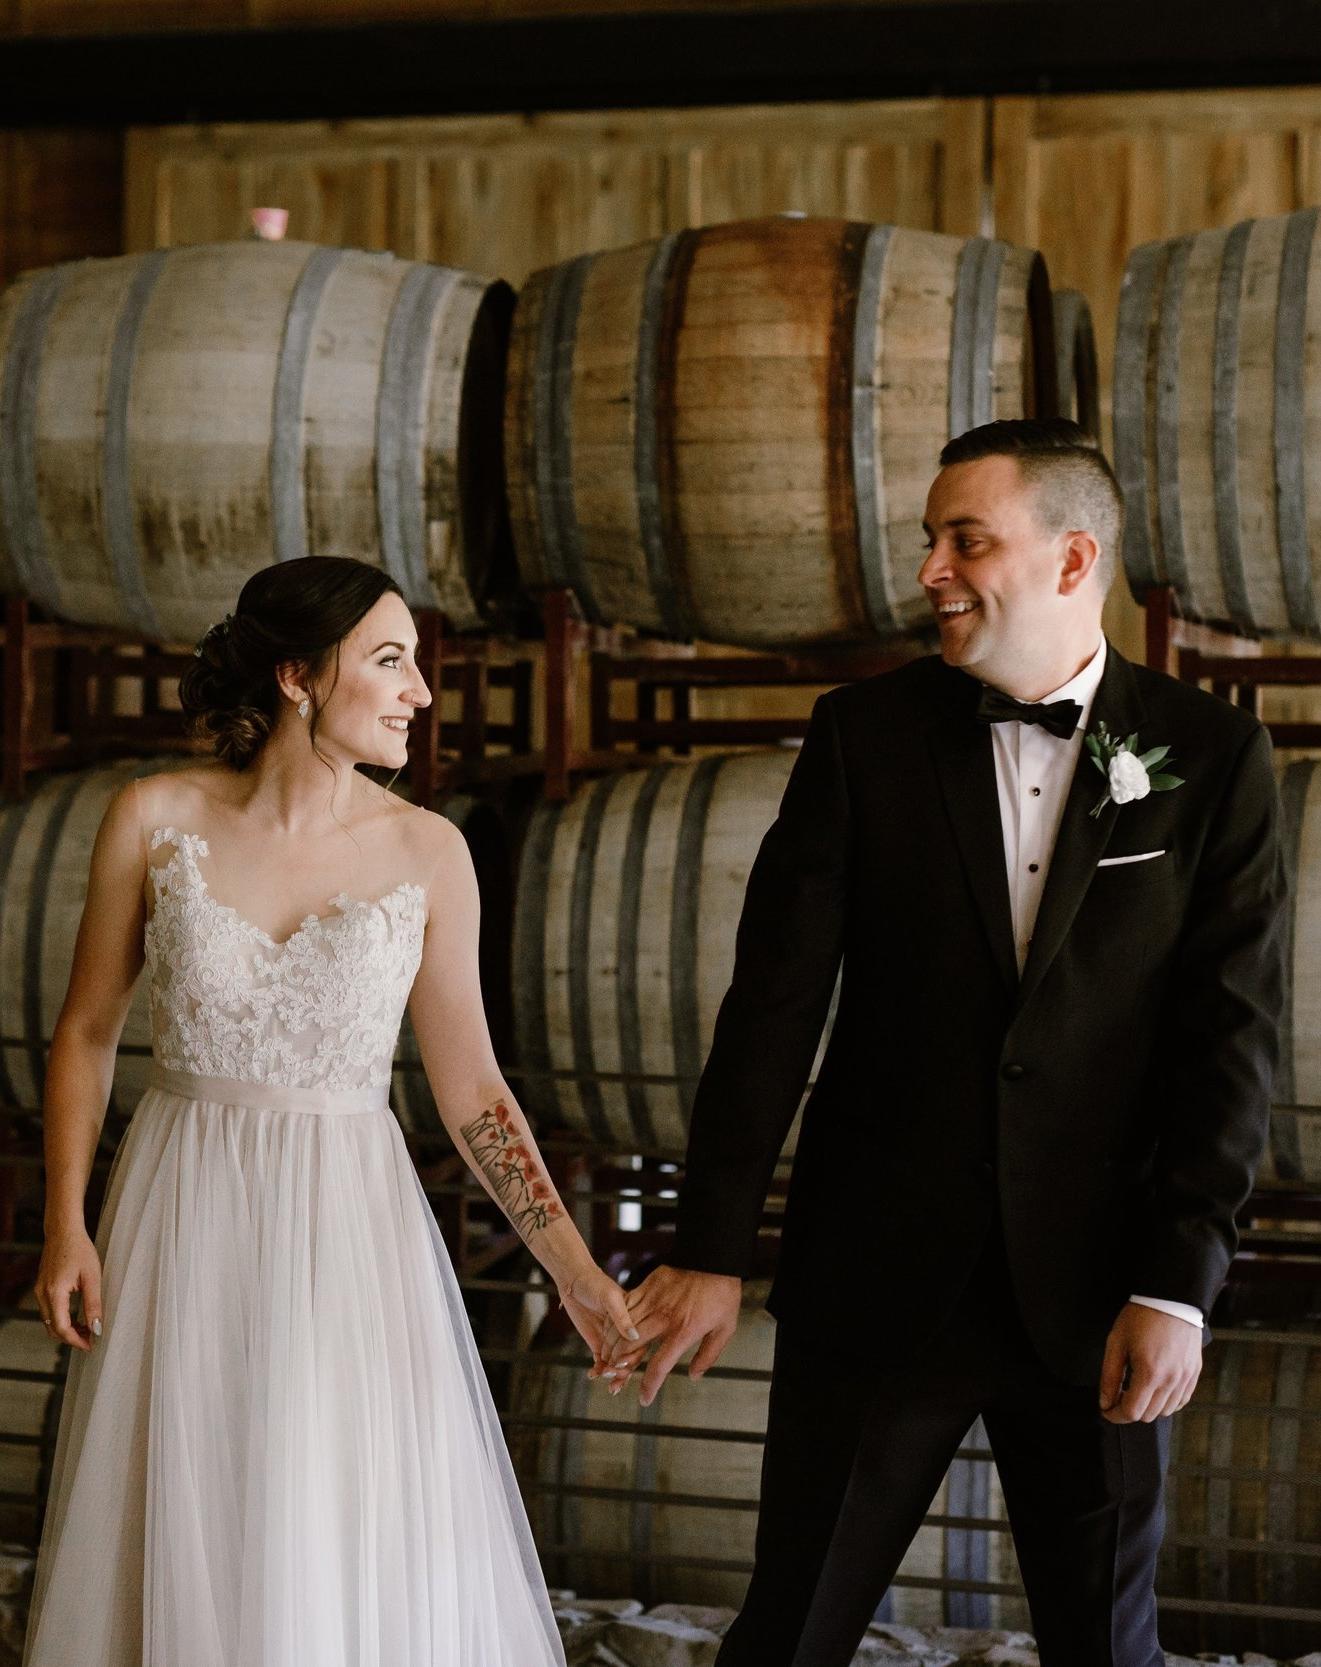 Portland_wedding_planner_maysara_winery_01.jpg